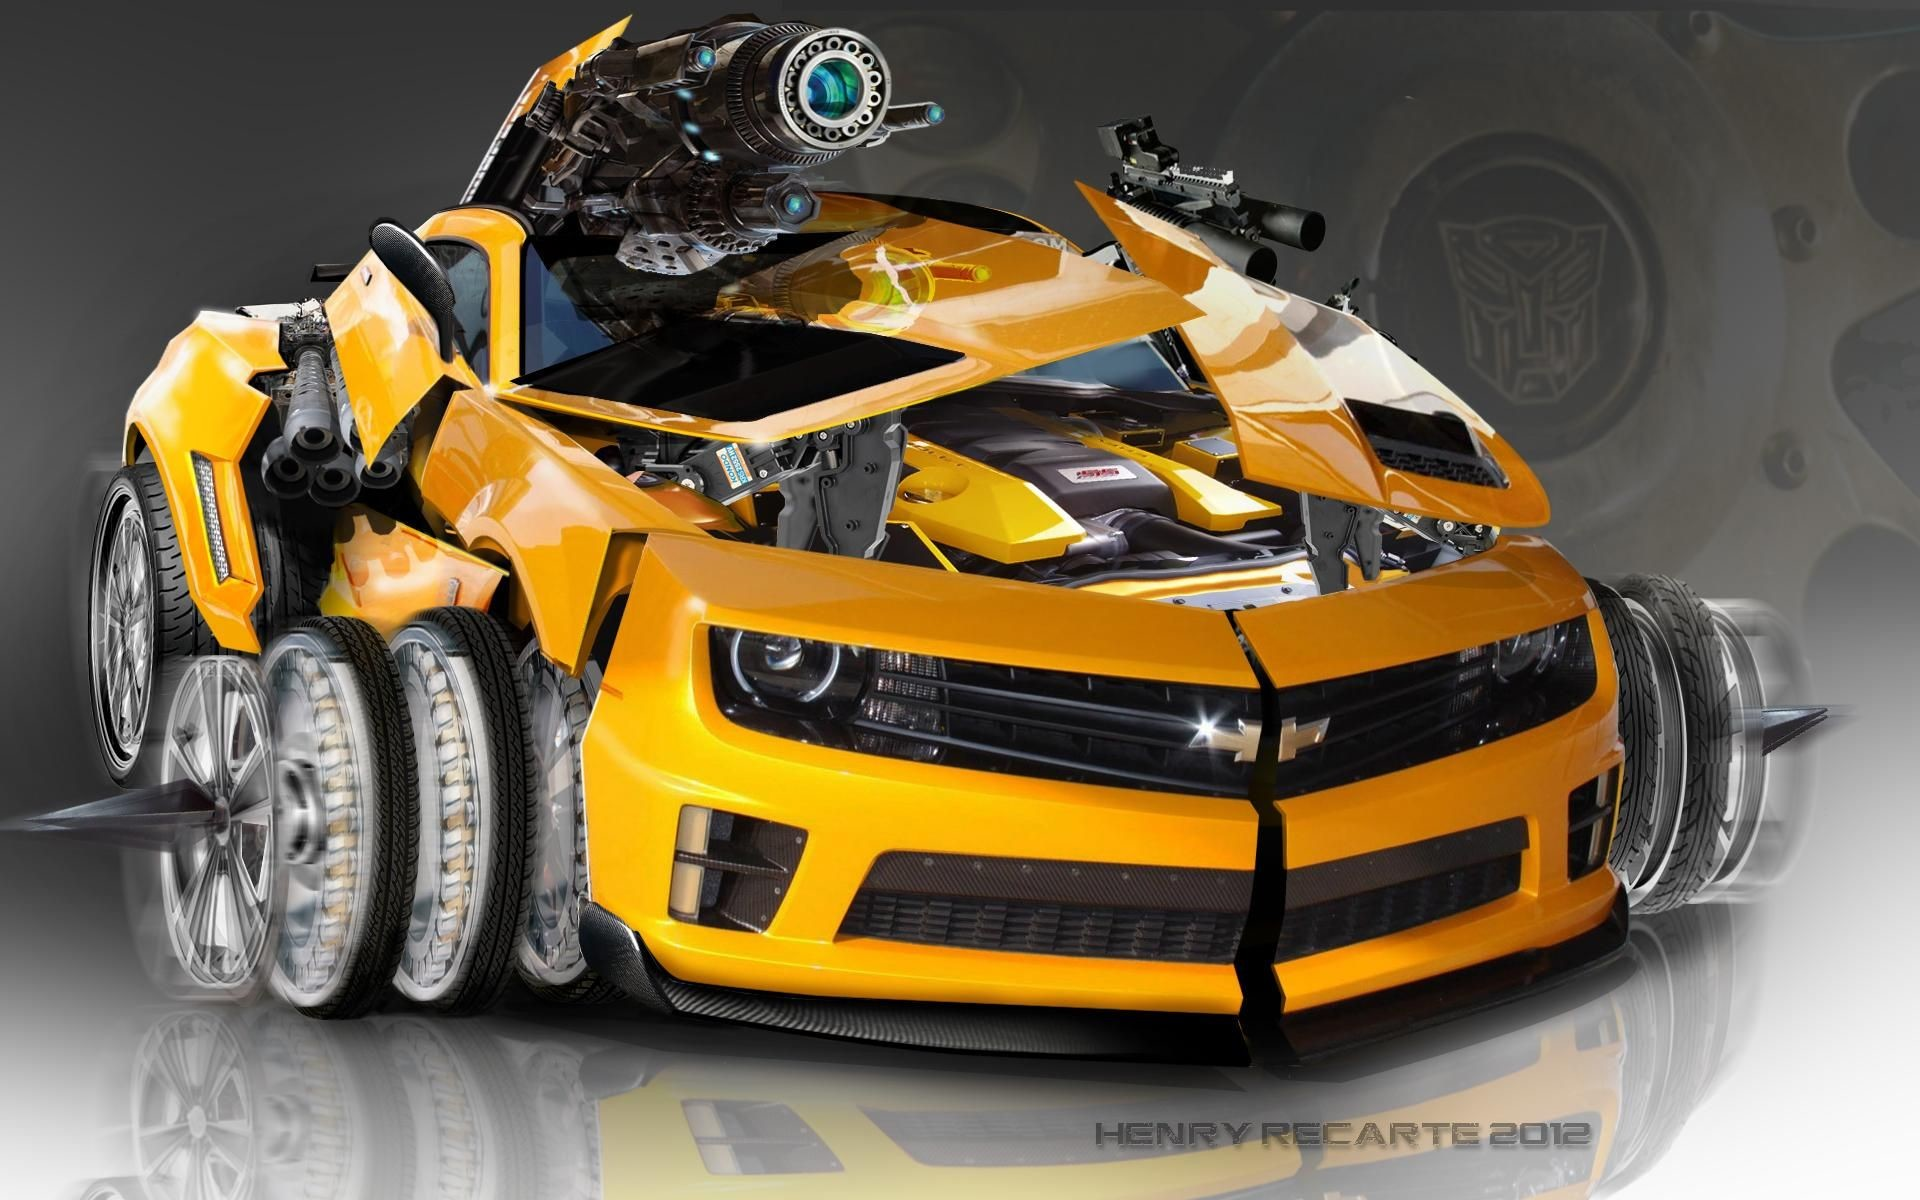 Res: 1920x1200, Transformers Bumblebee Wallpapers Wallpaper × Transformer